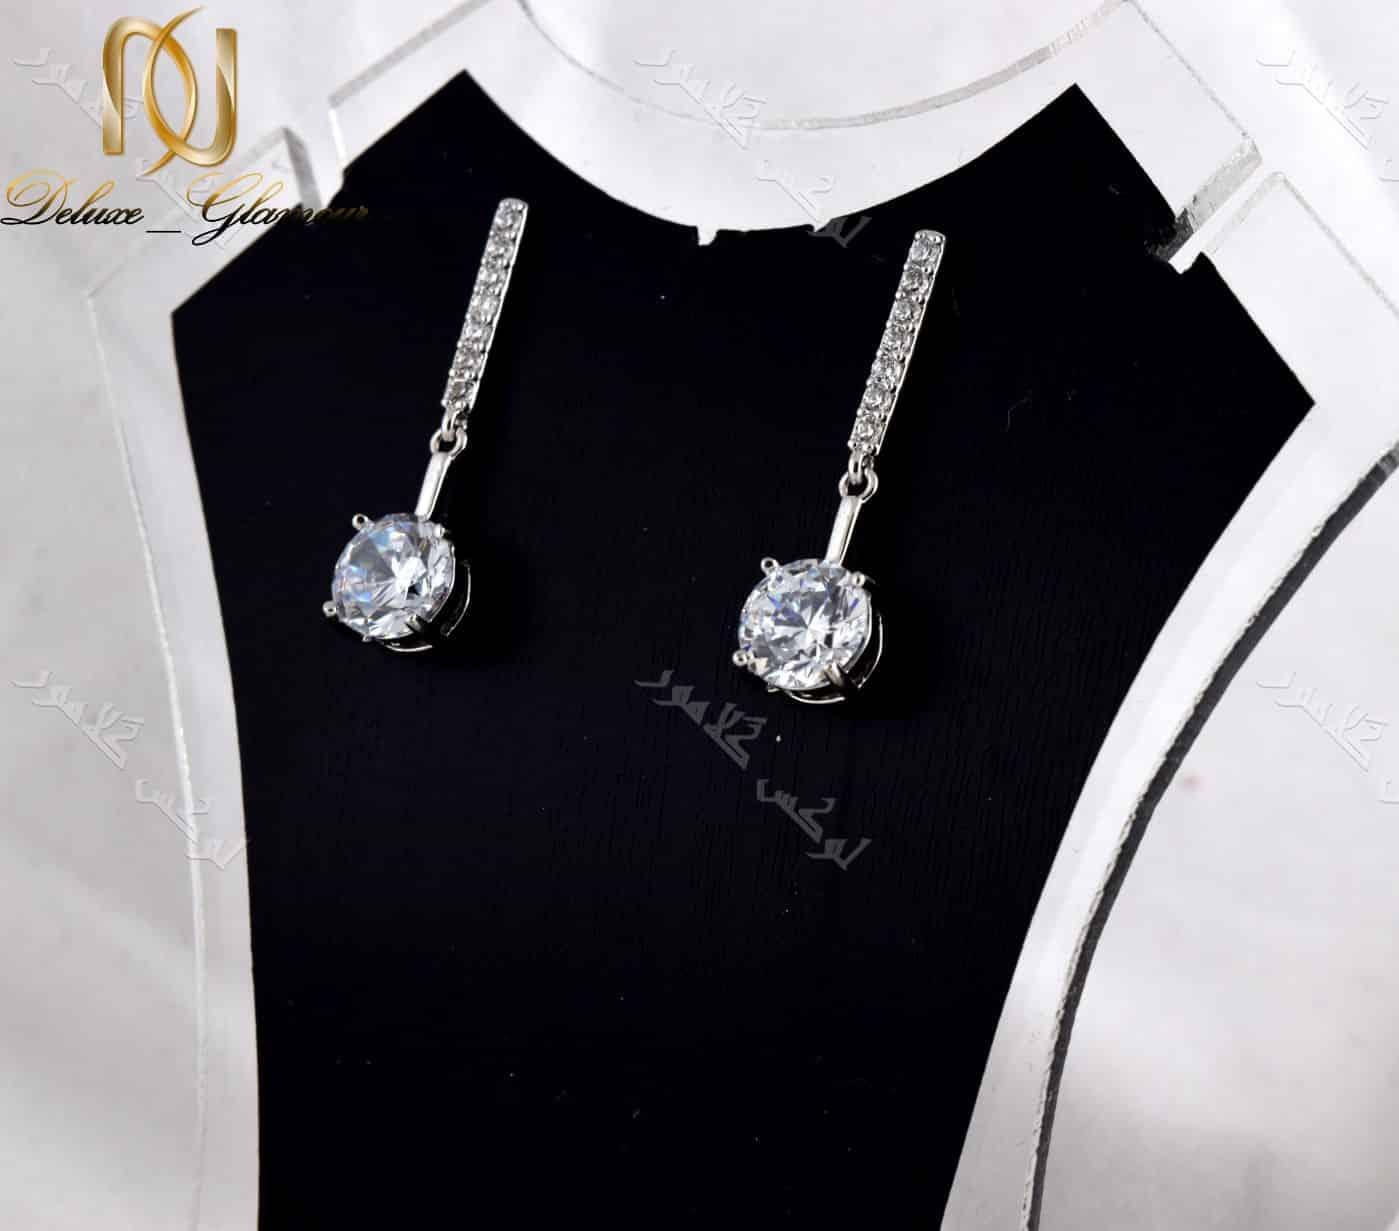 گوشواره آویزی جواهری کلیو با کریستالهای سواروفسکی.عکس اصلی